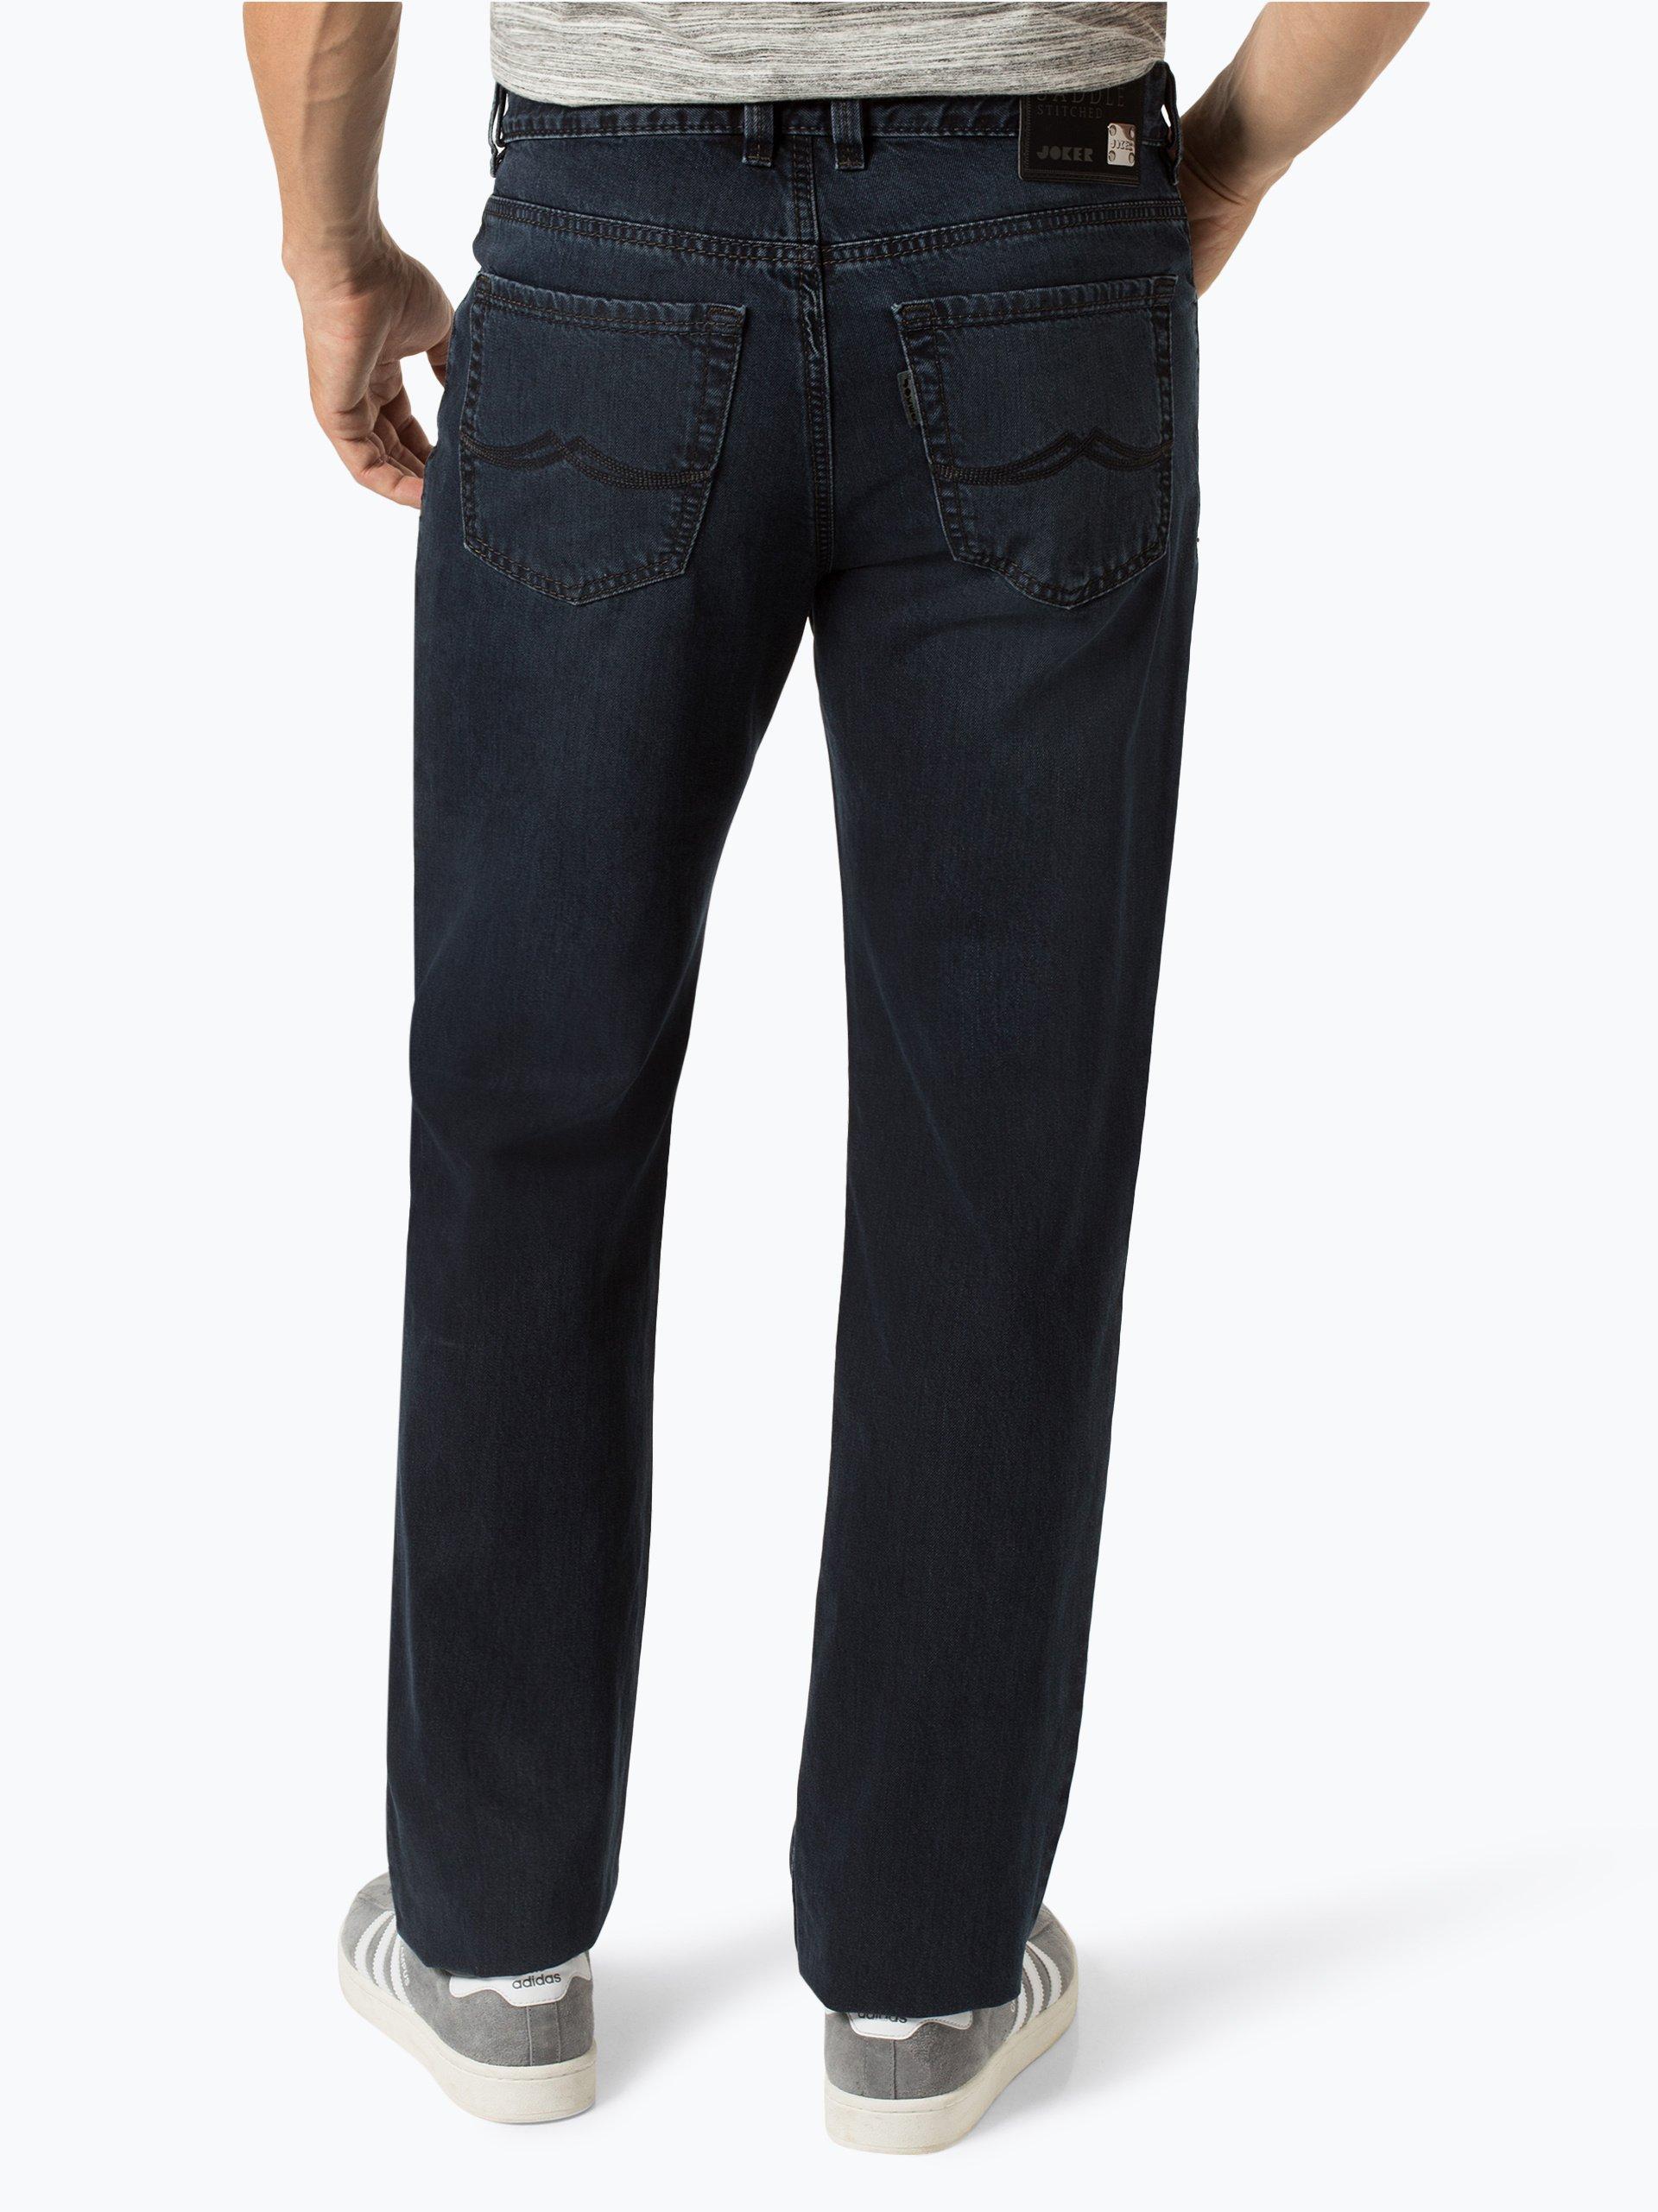 joker herren jeans blue stone uni online kaufen vangraaf com. Black Bedroom Furniture Sets. Home Design Ideas